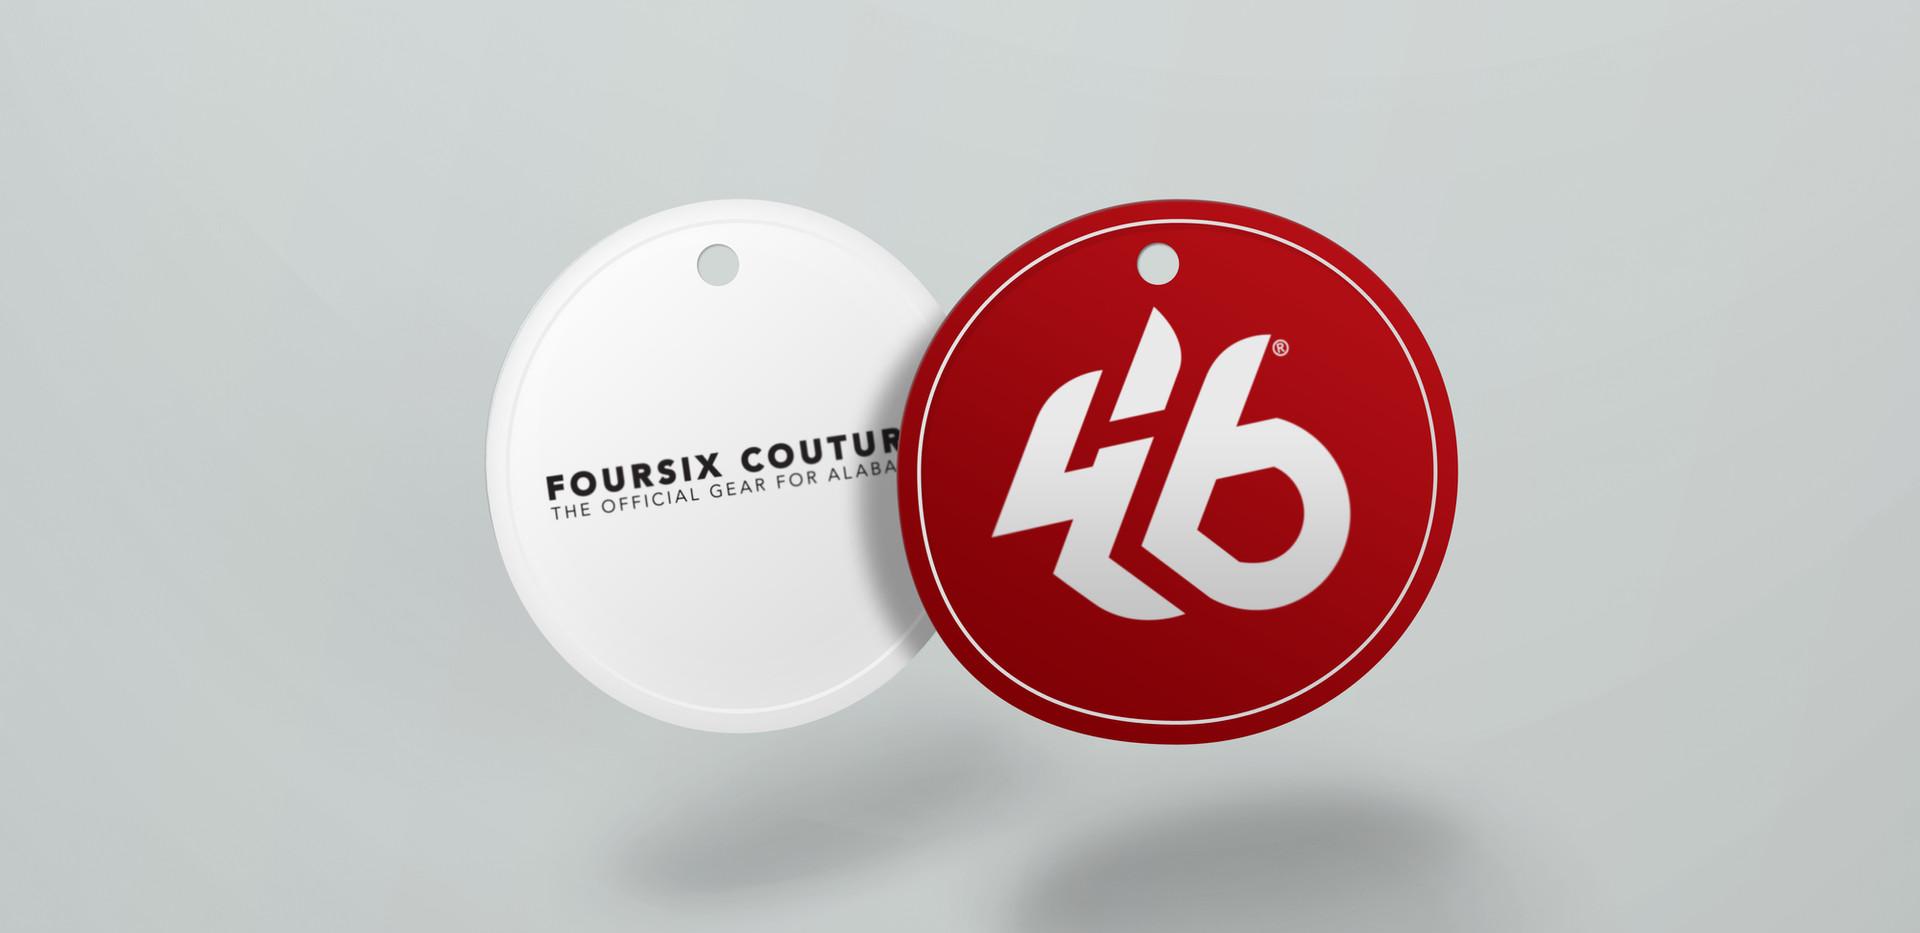 Foursix Clothing Tag